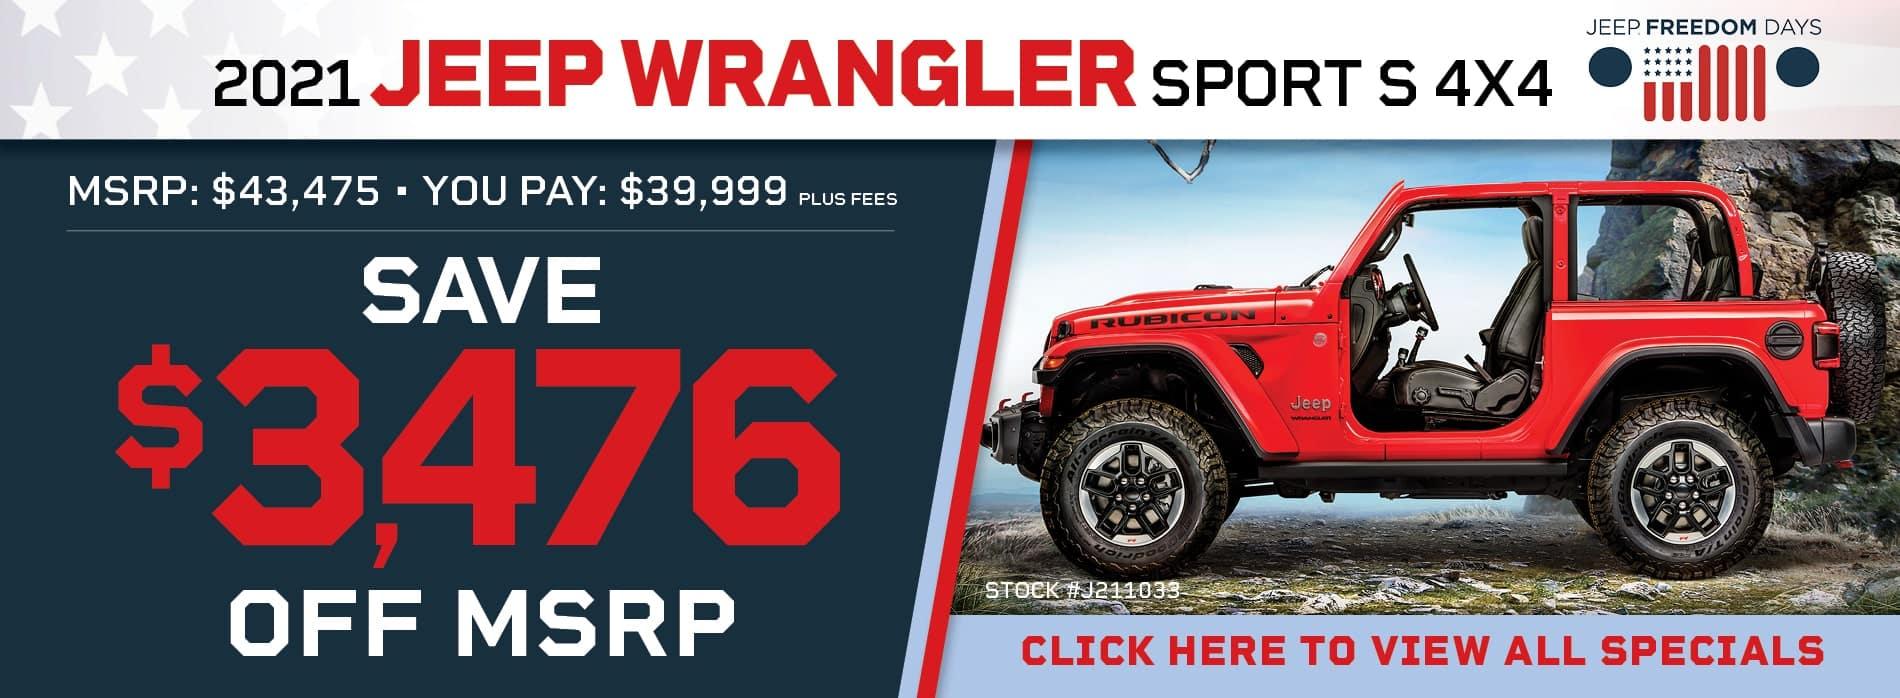 060421 Jeep Banners5-min